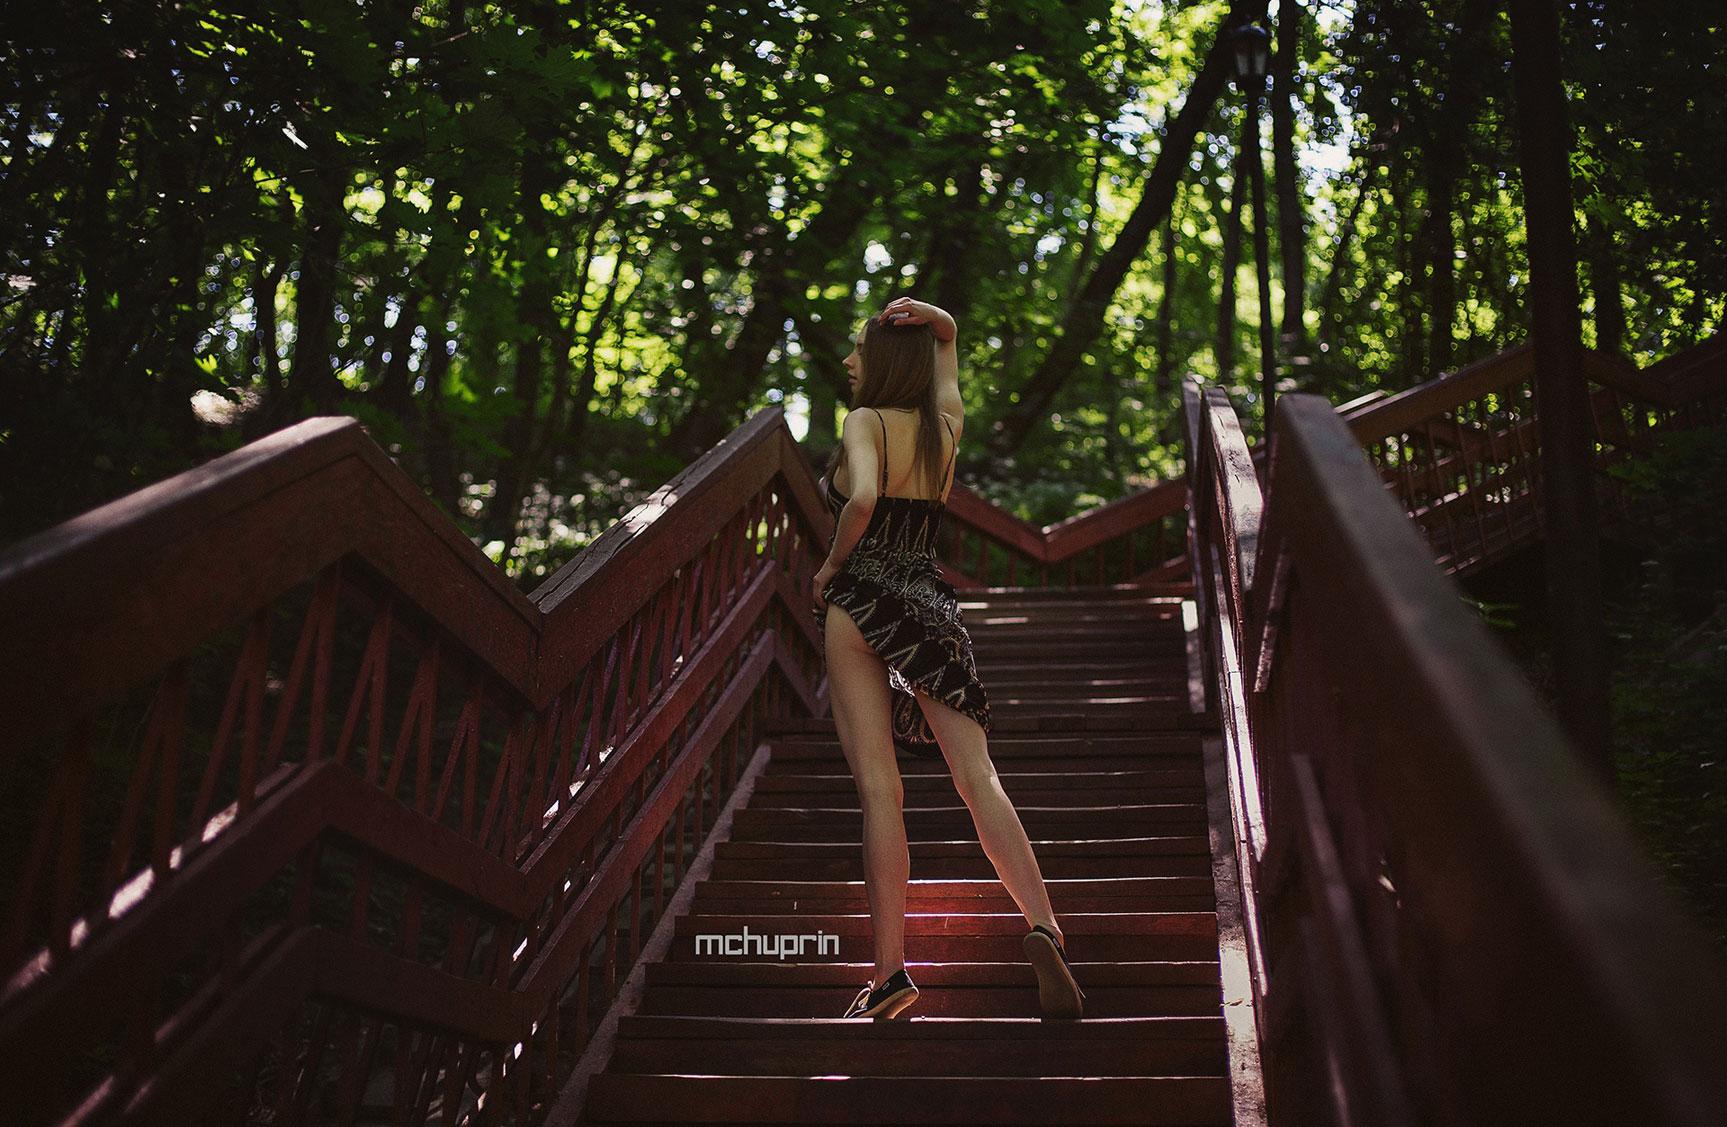 прогулки на природе с Катериной Райх / Katerina Raih naked by Maxim Chuprin